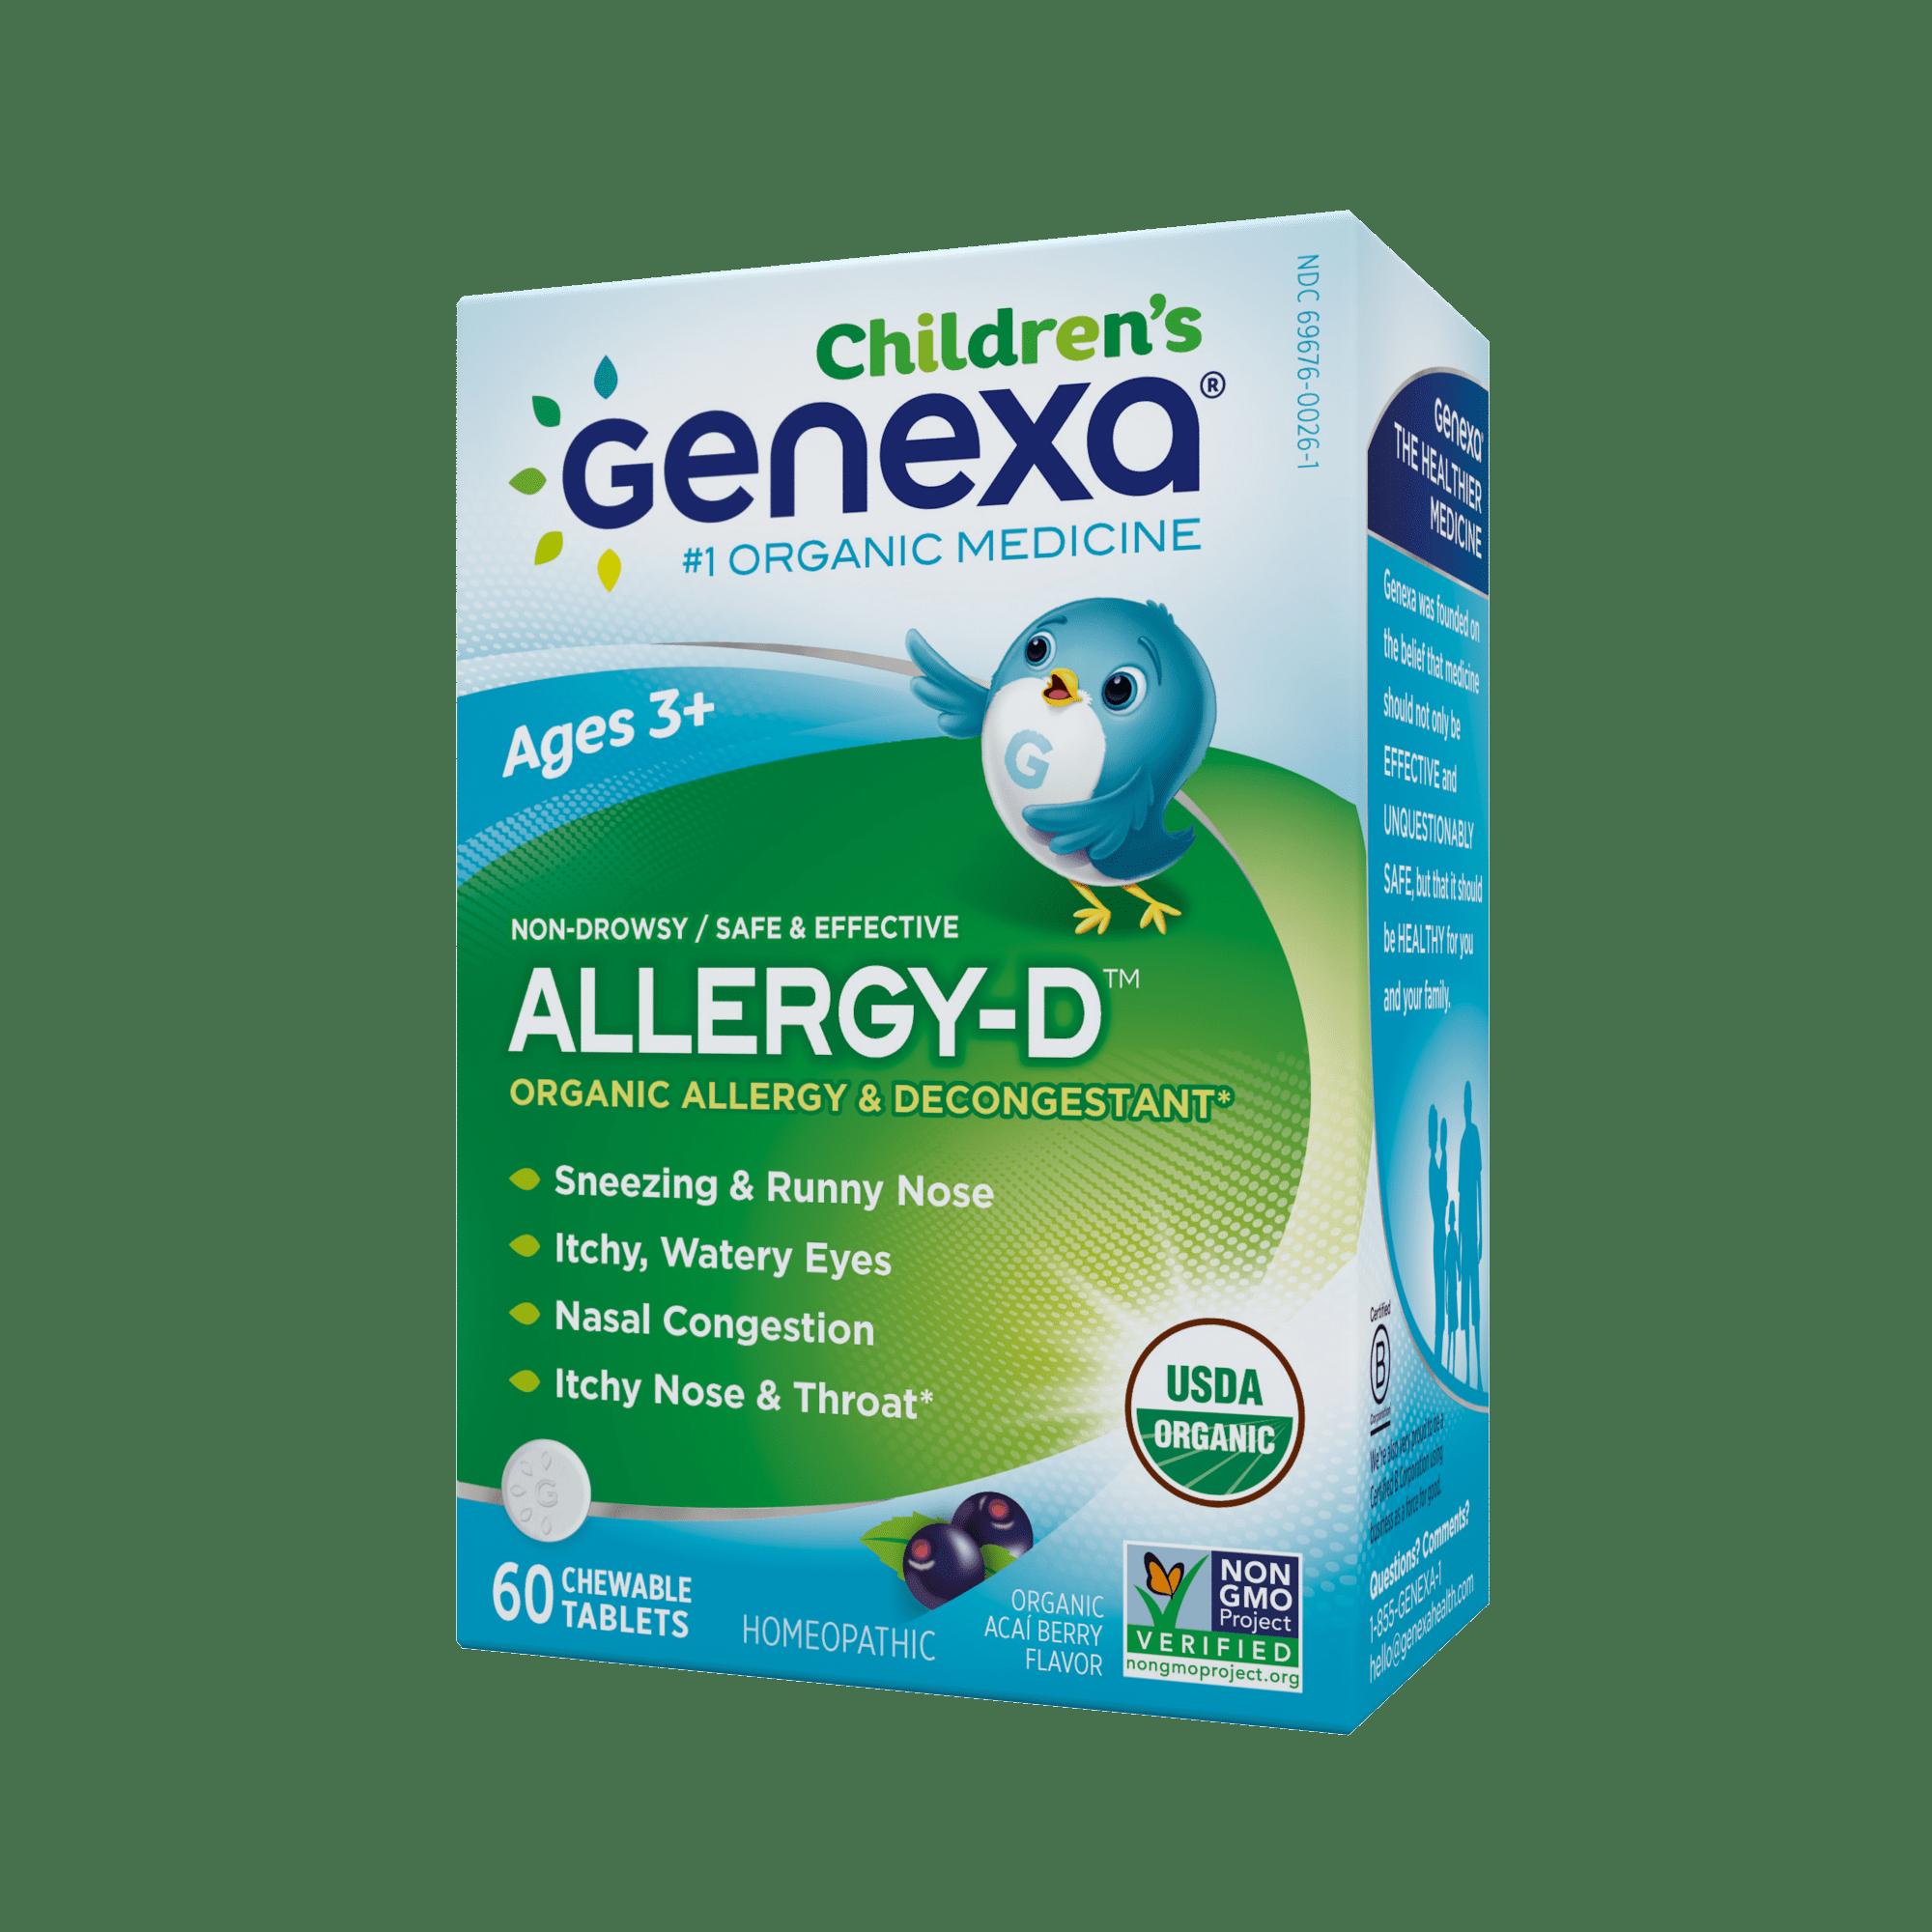 Genexa Homeopathic Allergy for Children: The Only Certified Organic Kids Allergy &...